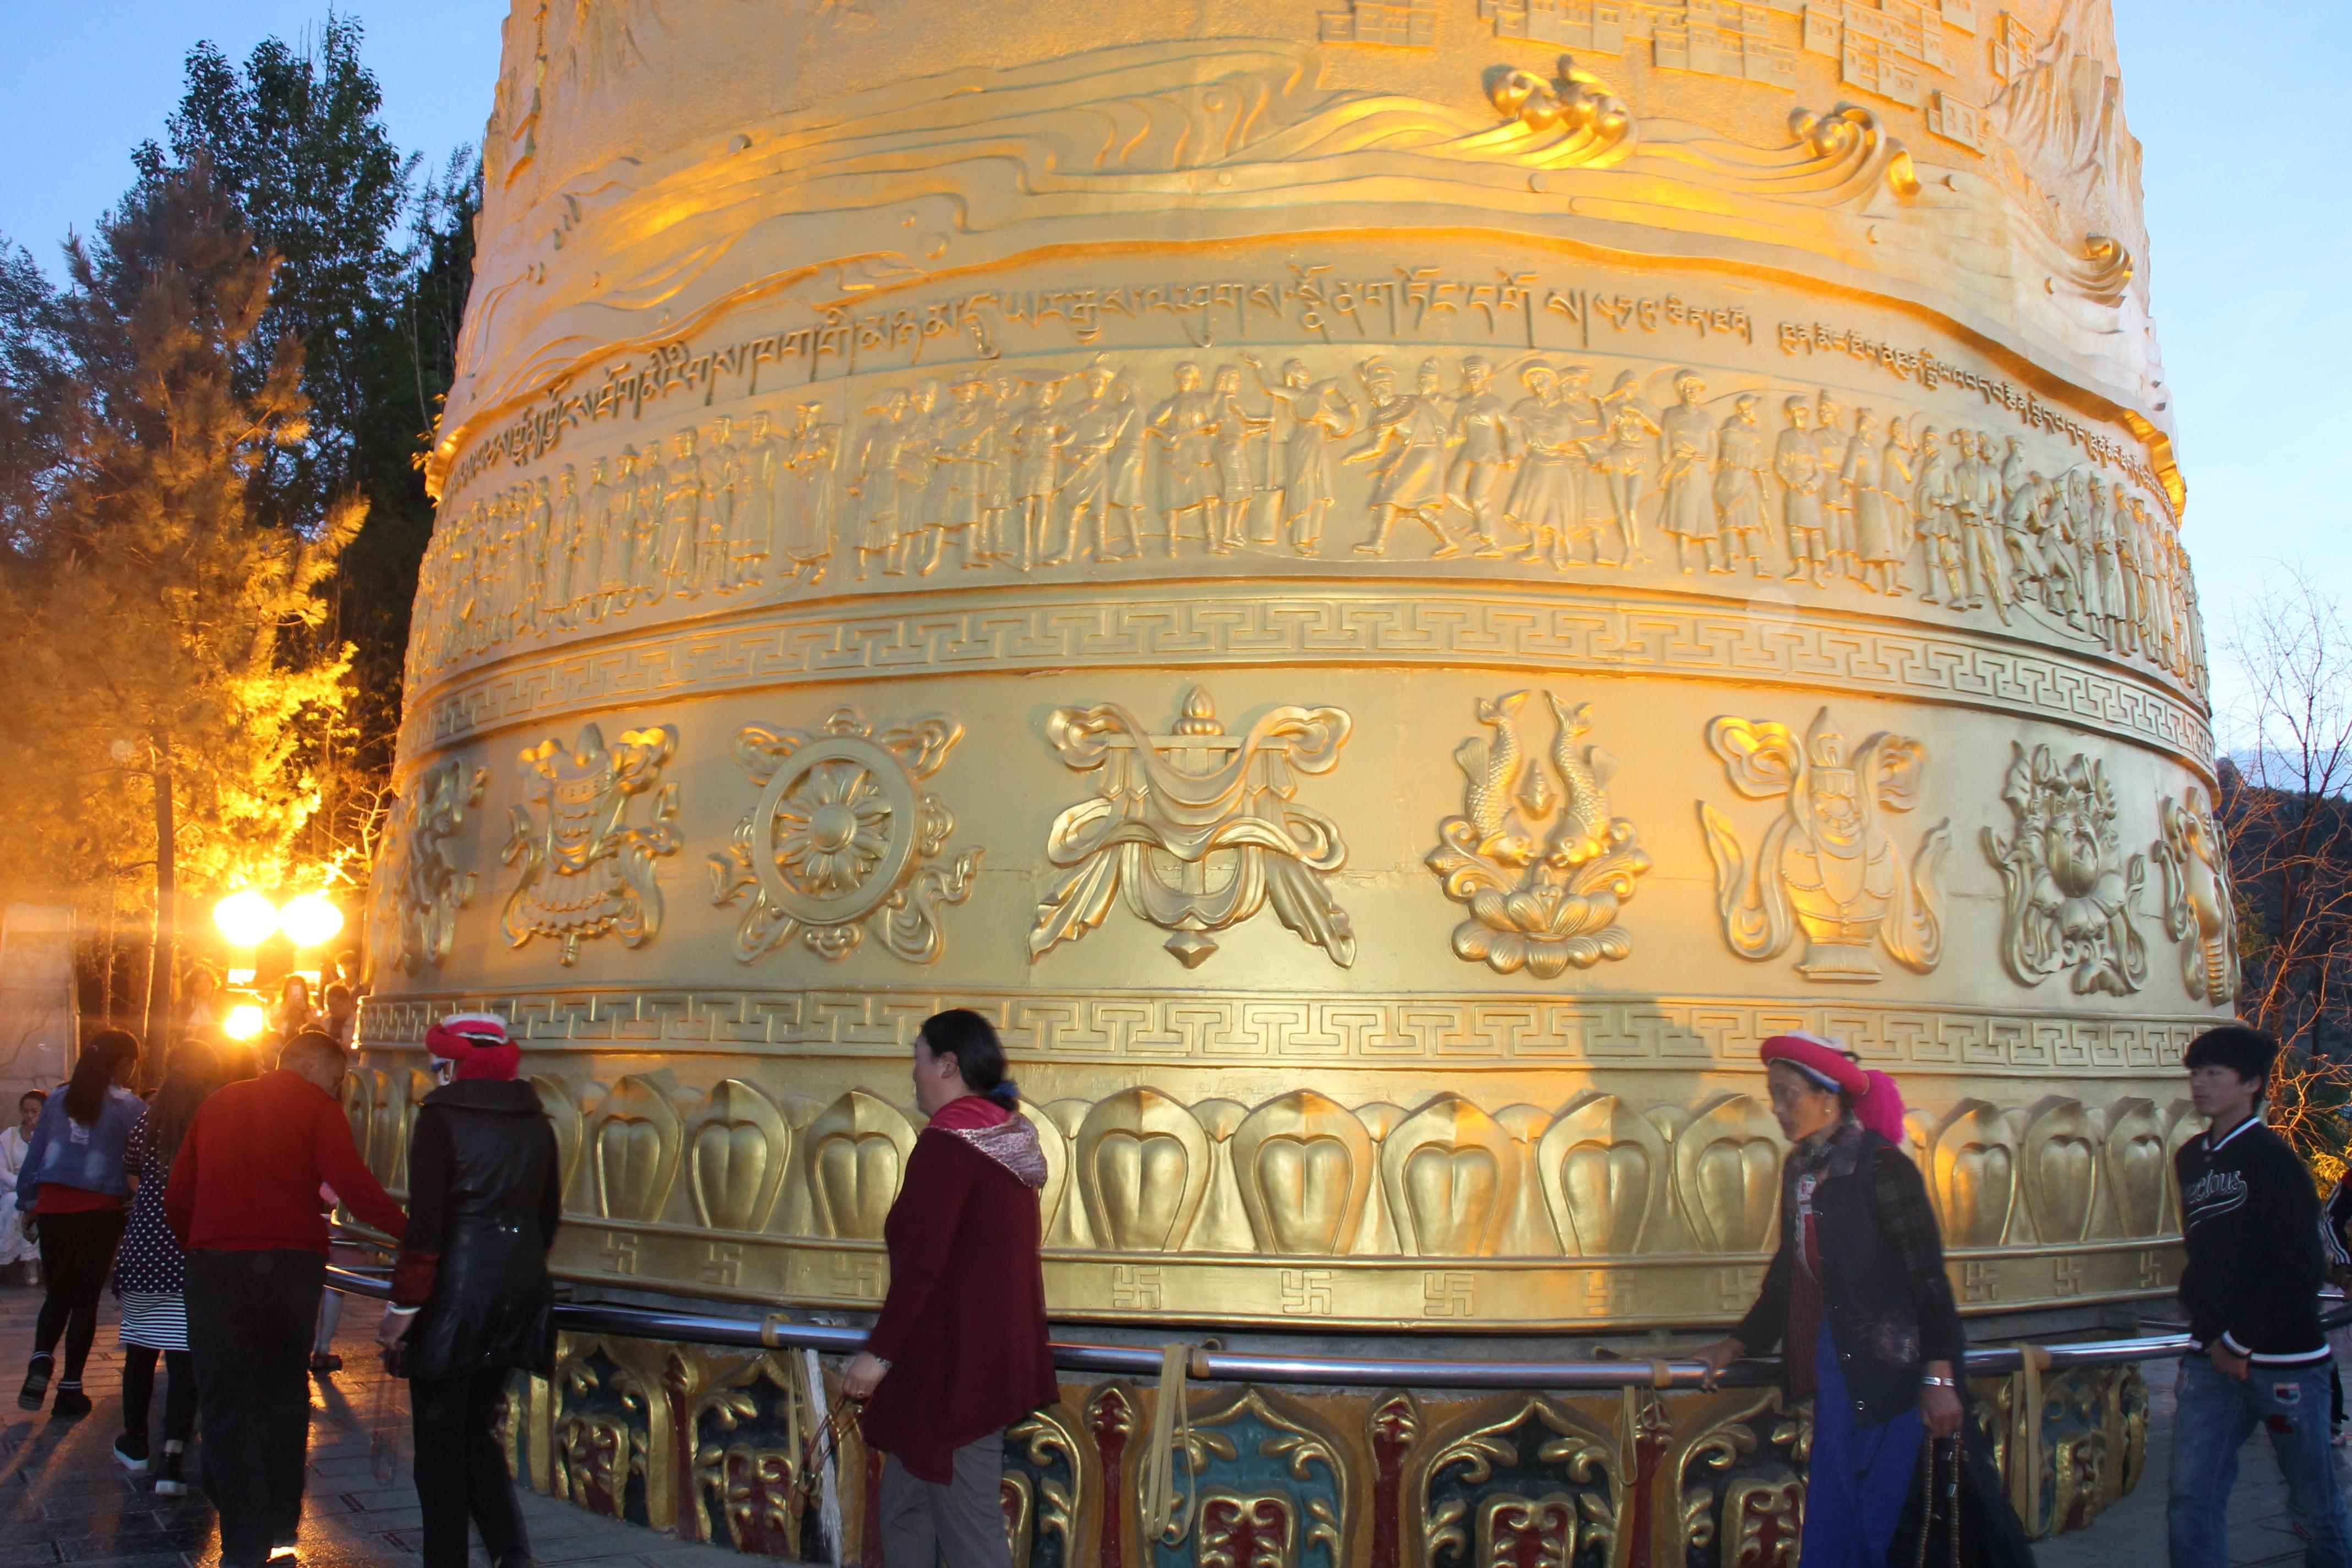 locals spinning prayer wheel shangrila china